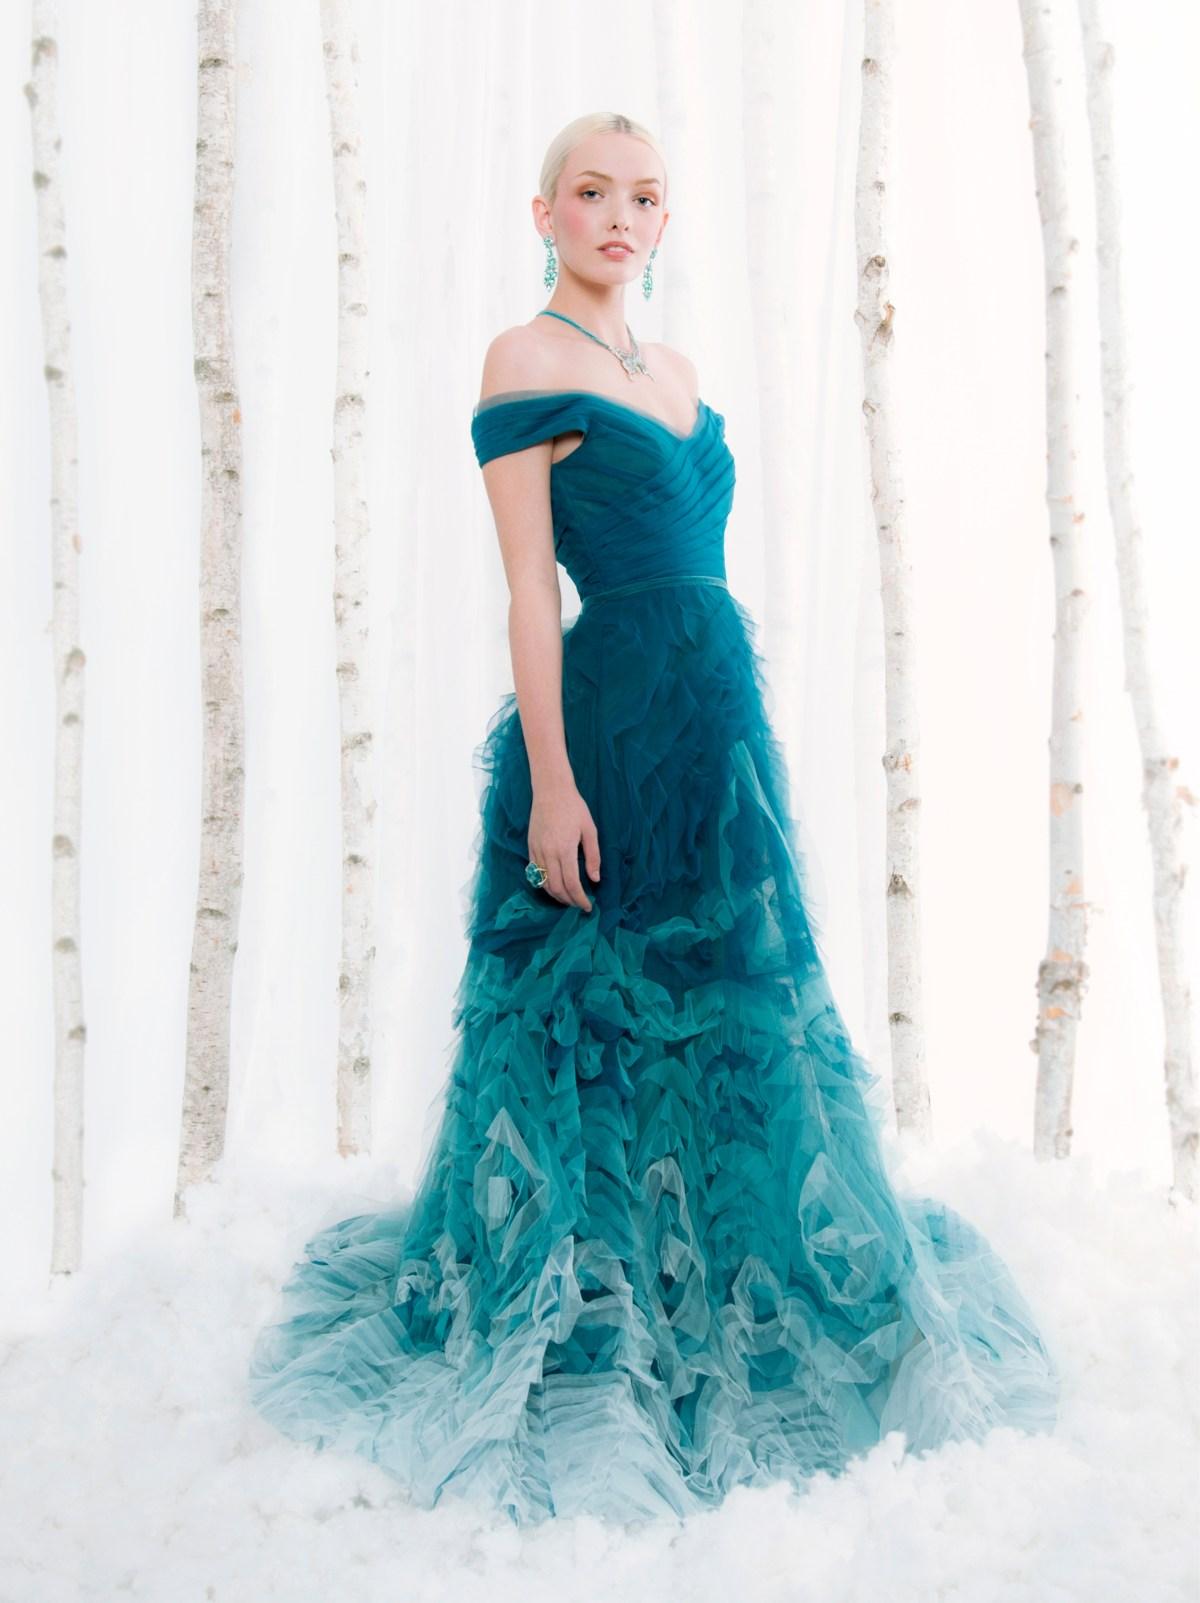 frozen fantasy winter fashion